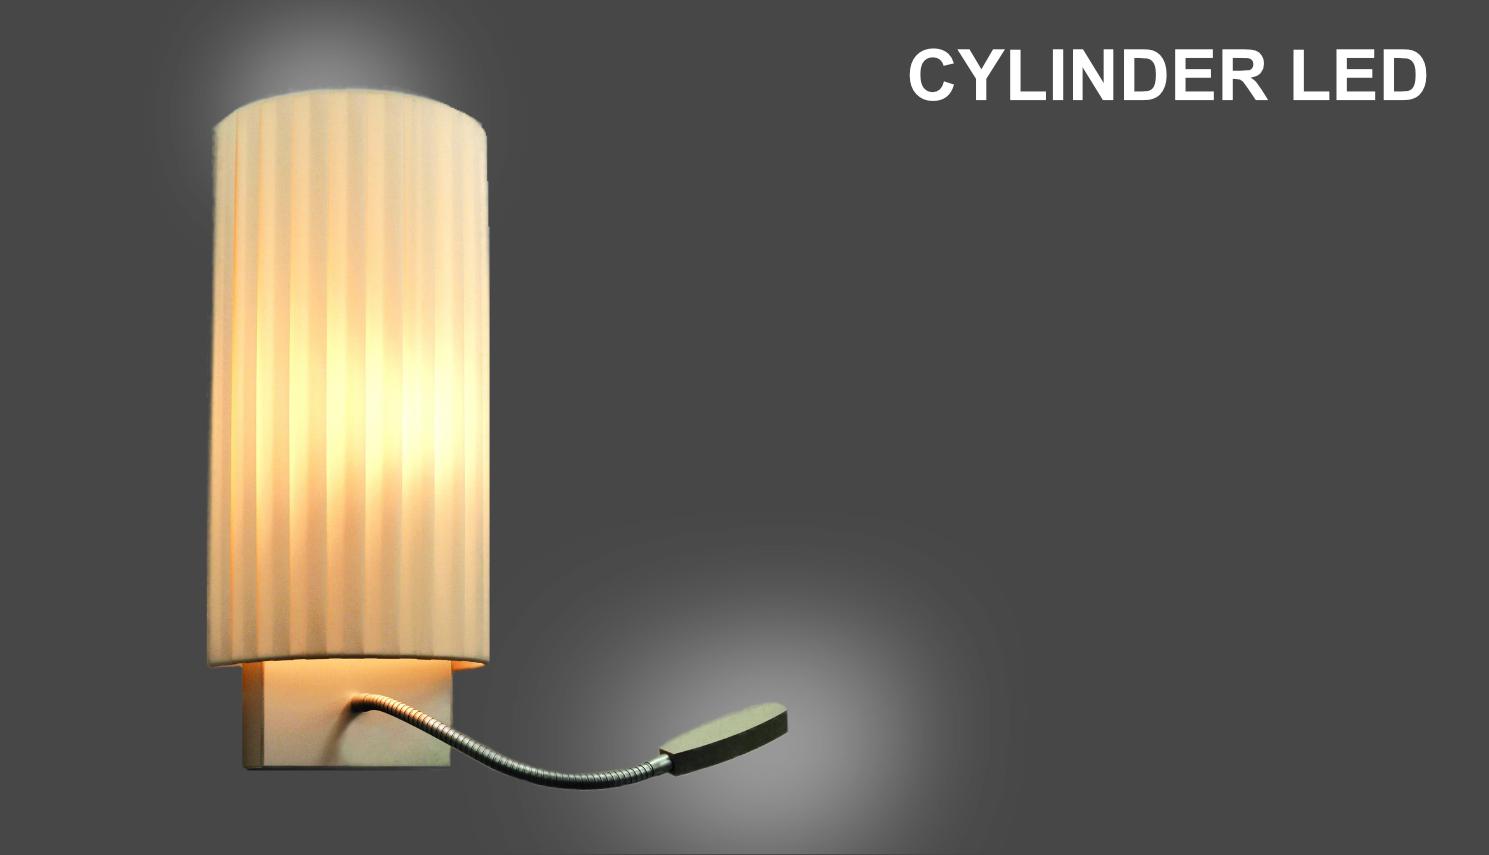 Cylinder LED